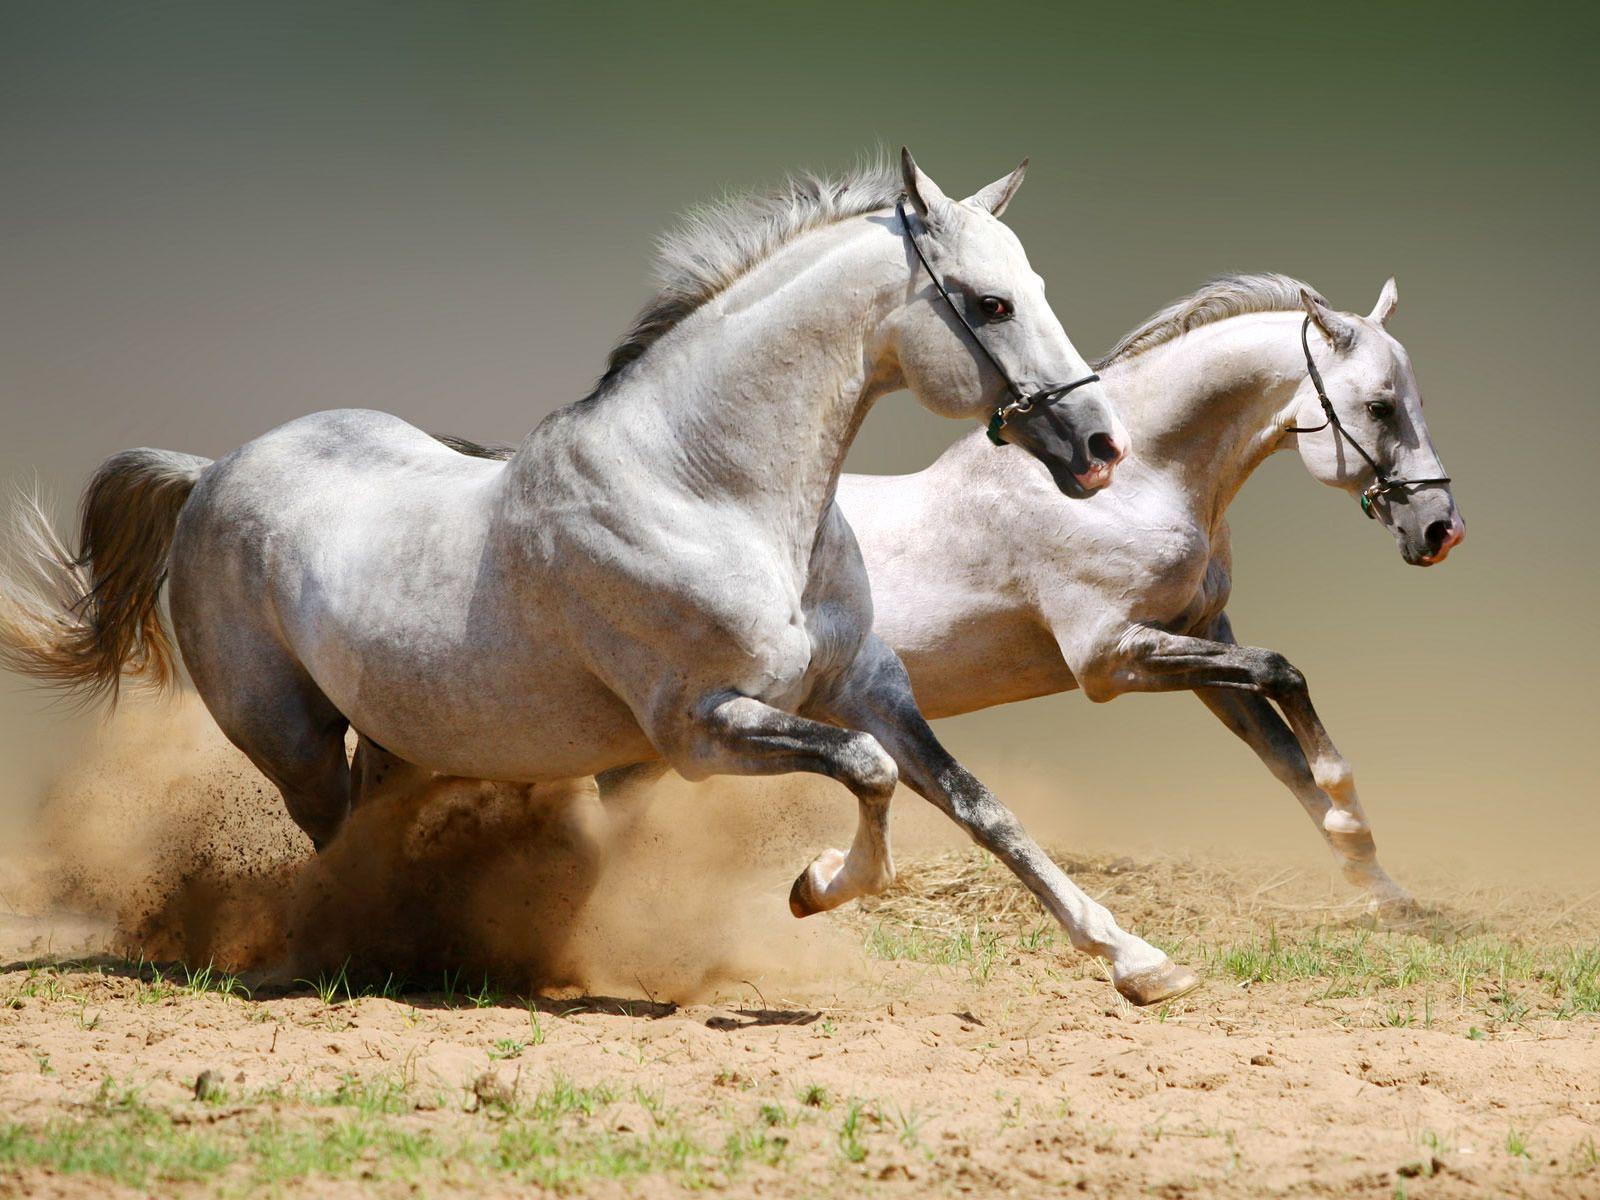 Amazing White Horses Wallpaper Caballos En Blanco Y Negro